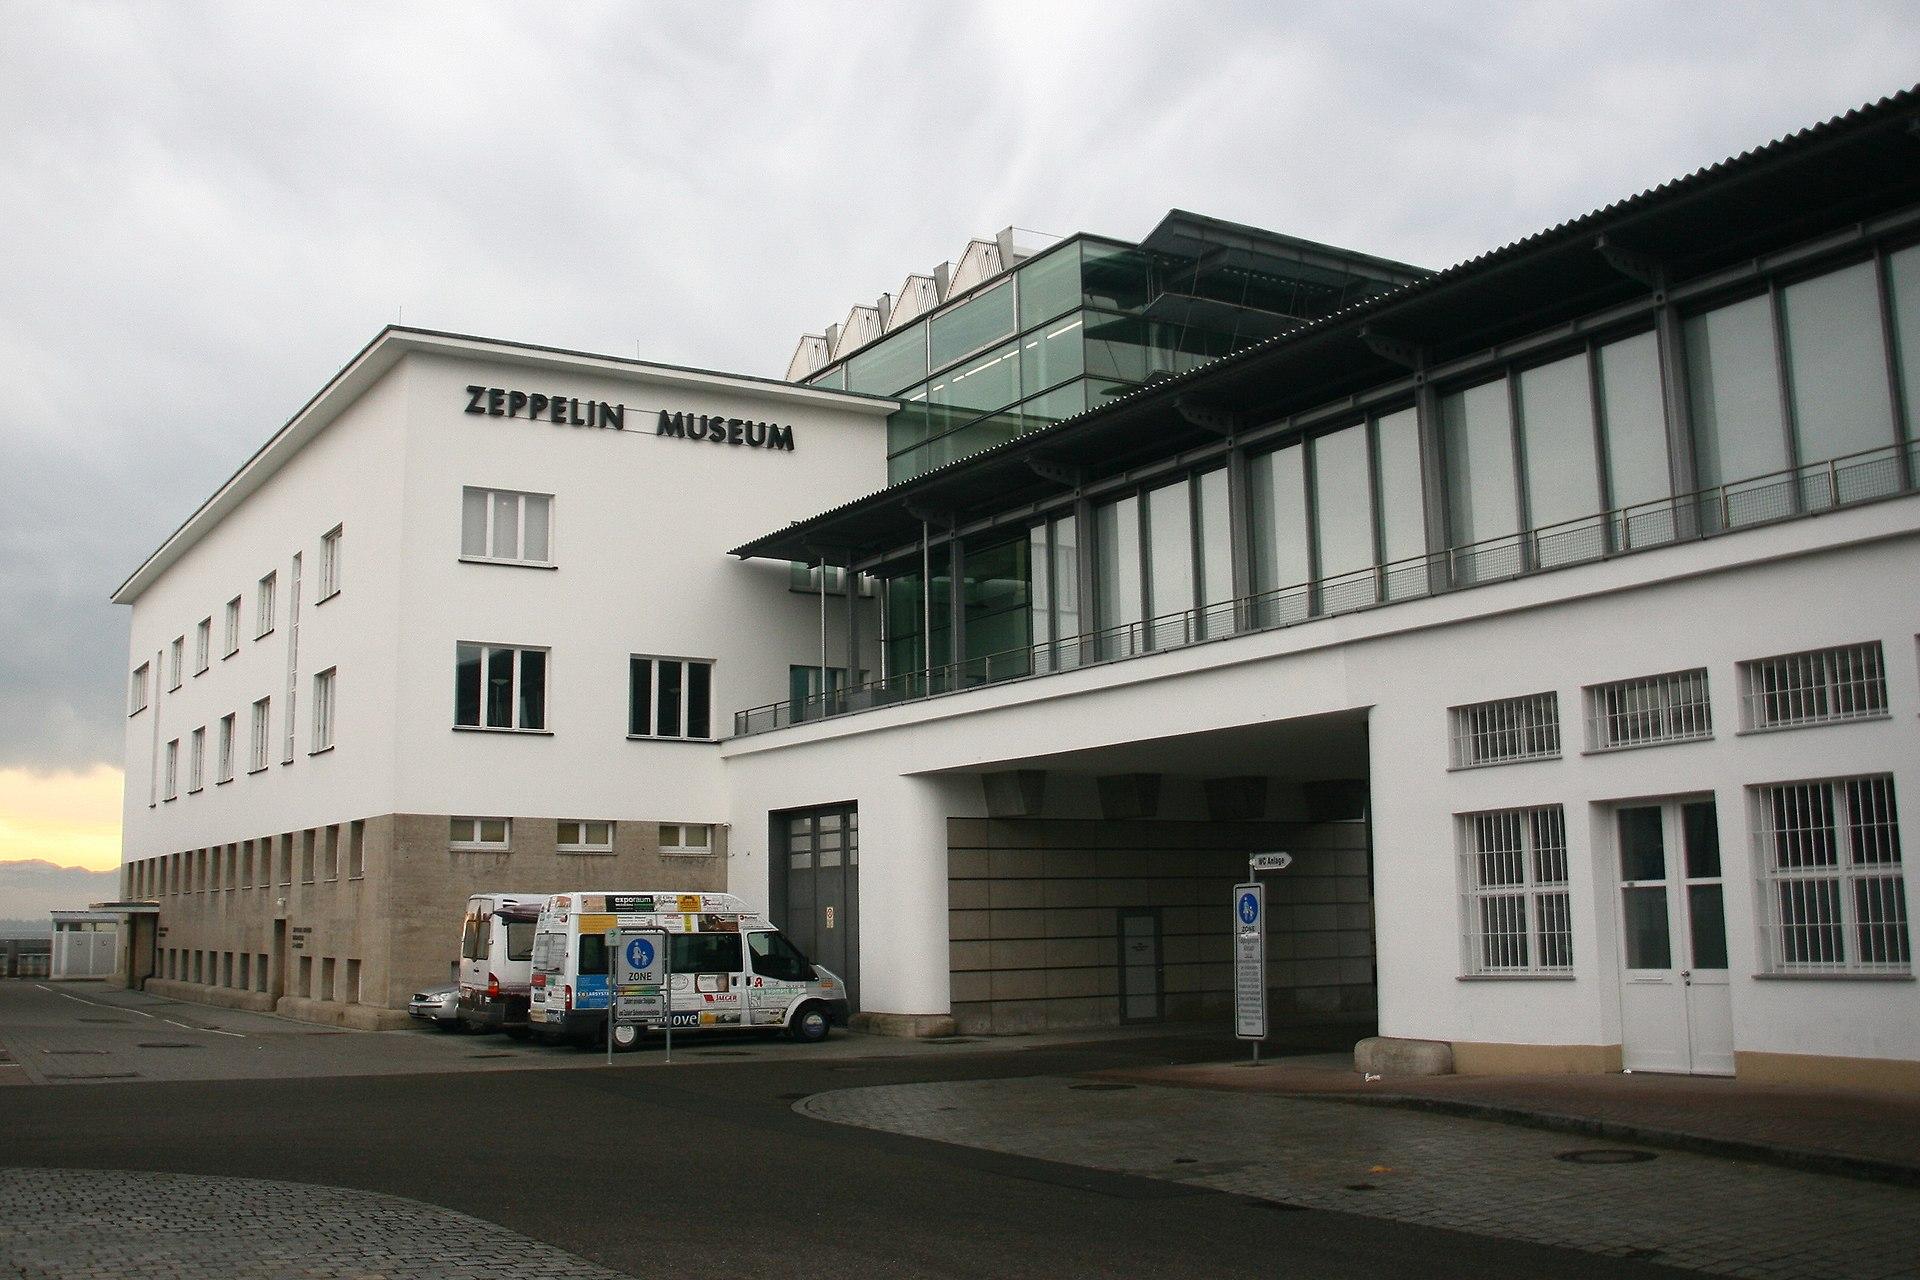 zeppelin museum friedrichshafen wikipedia. Black Bedroom Furniture Sets. Home Design Ideas